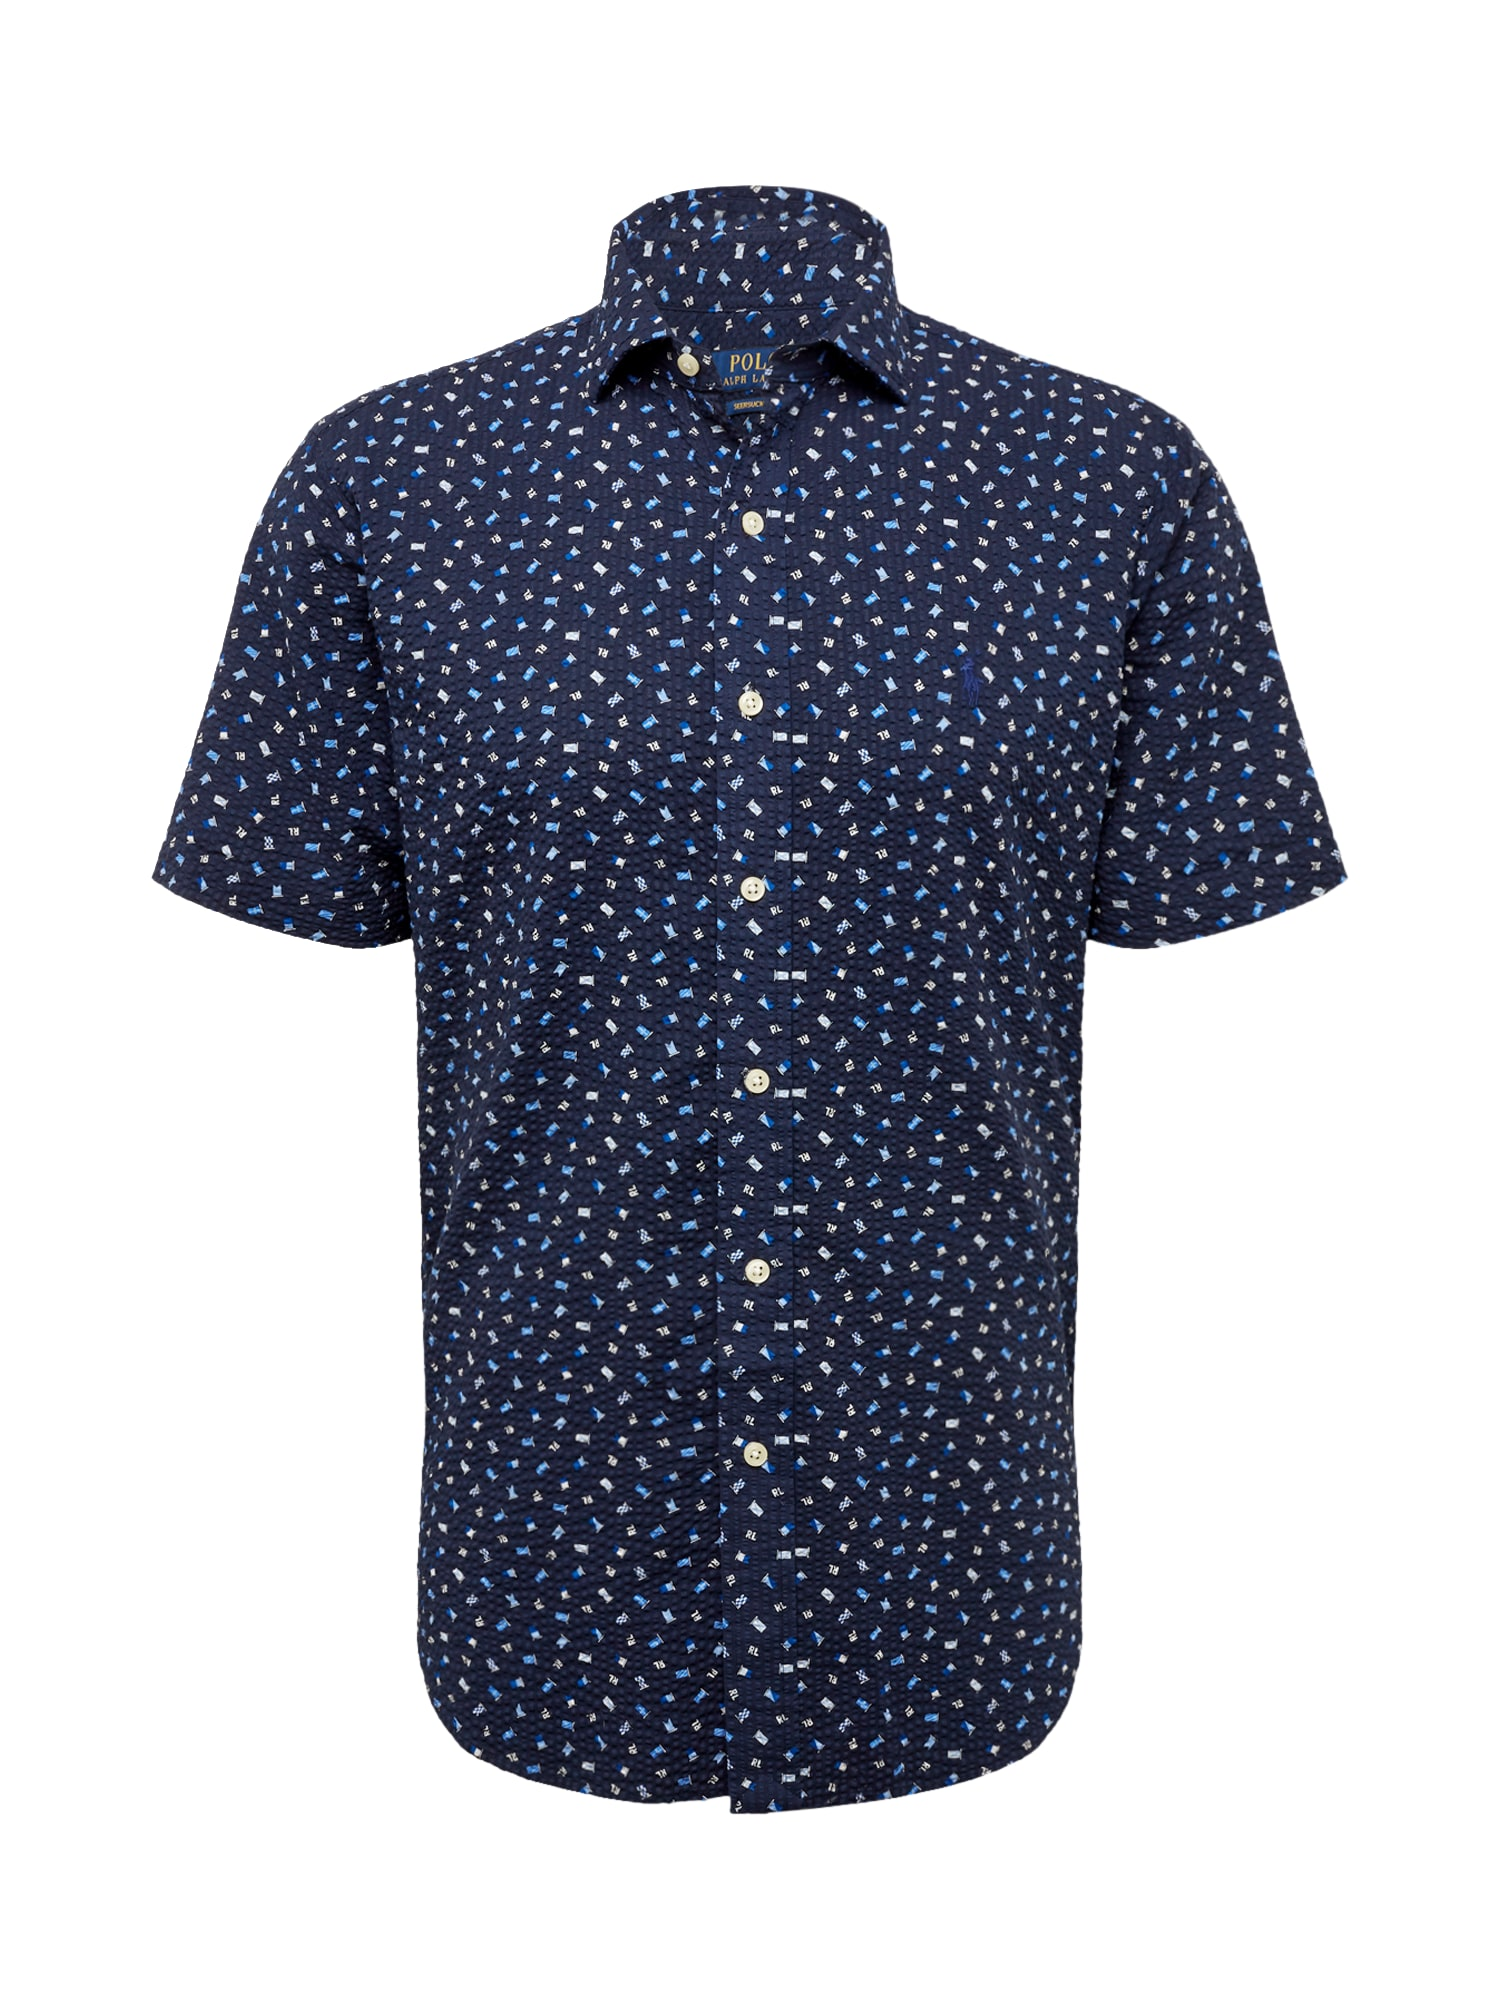 Košile SPRESTPPCSS-SHORT SLEEVE-SPORT SHIRT tmavě modrá mix barev POLO RALPH LAUREN